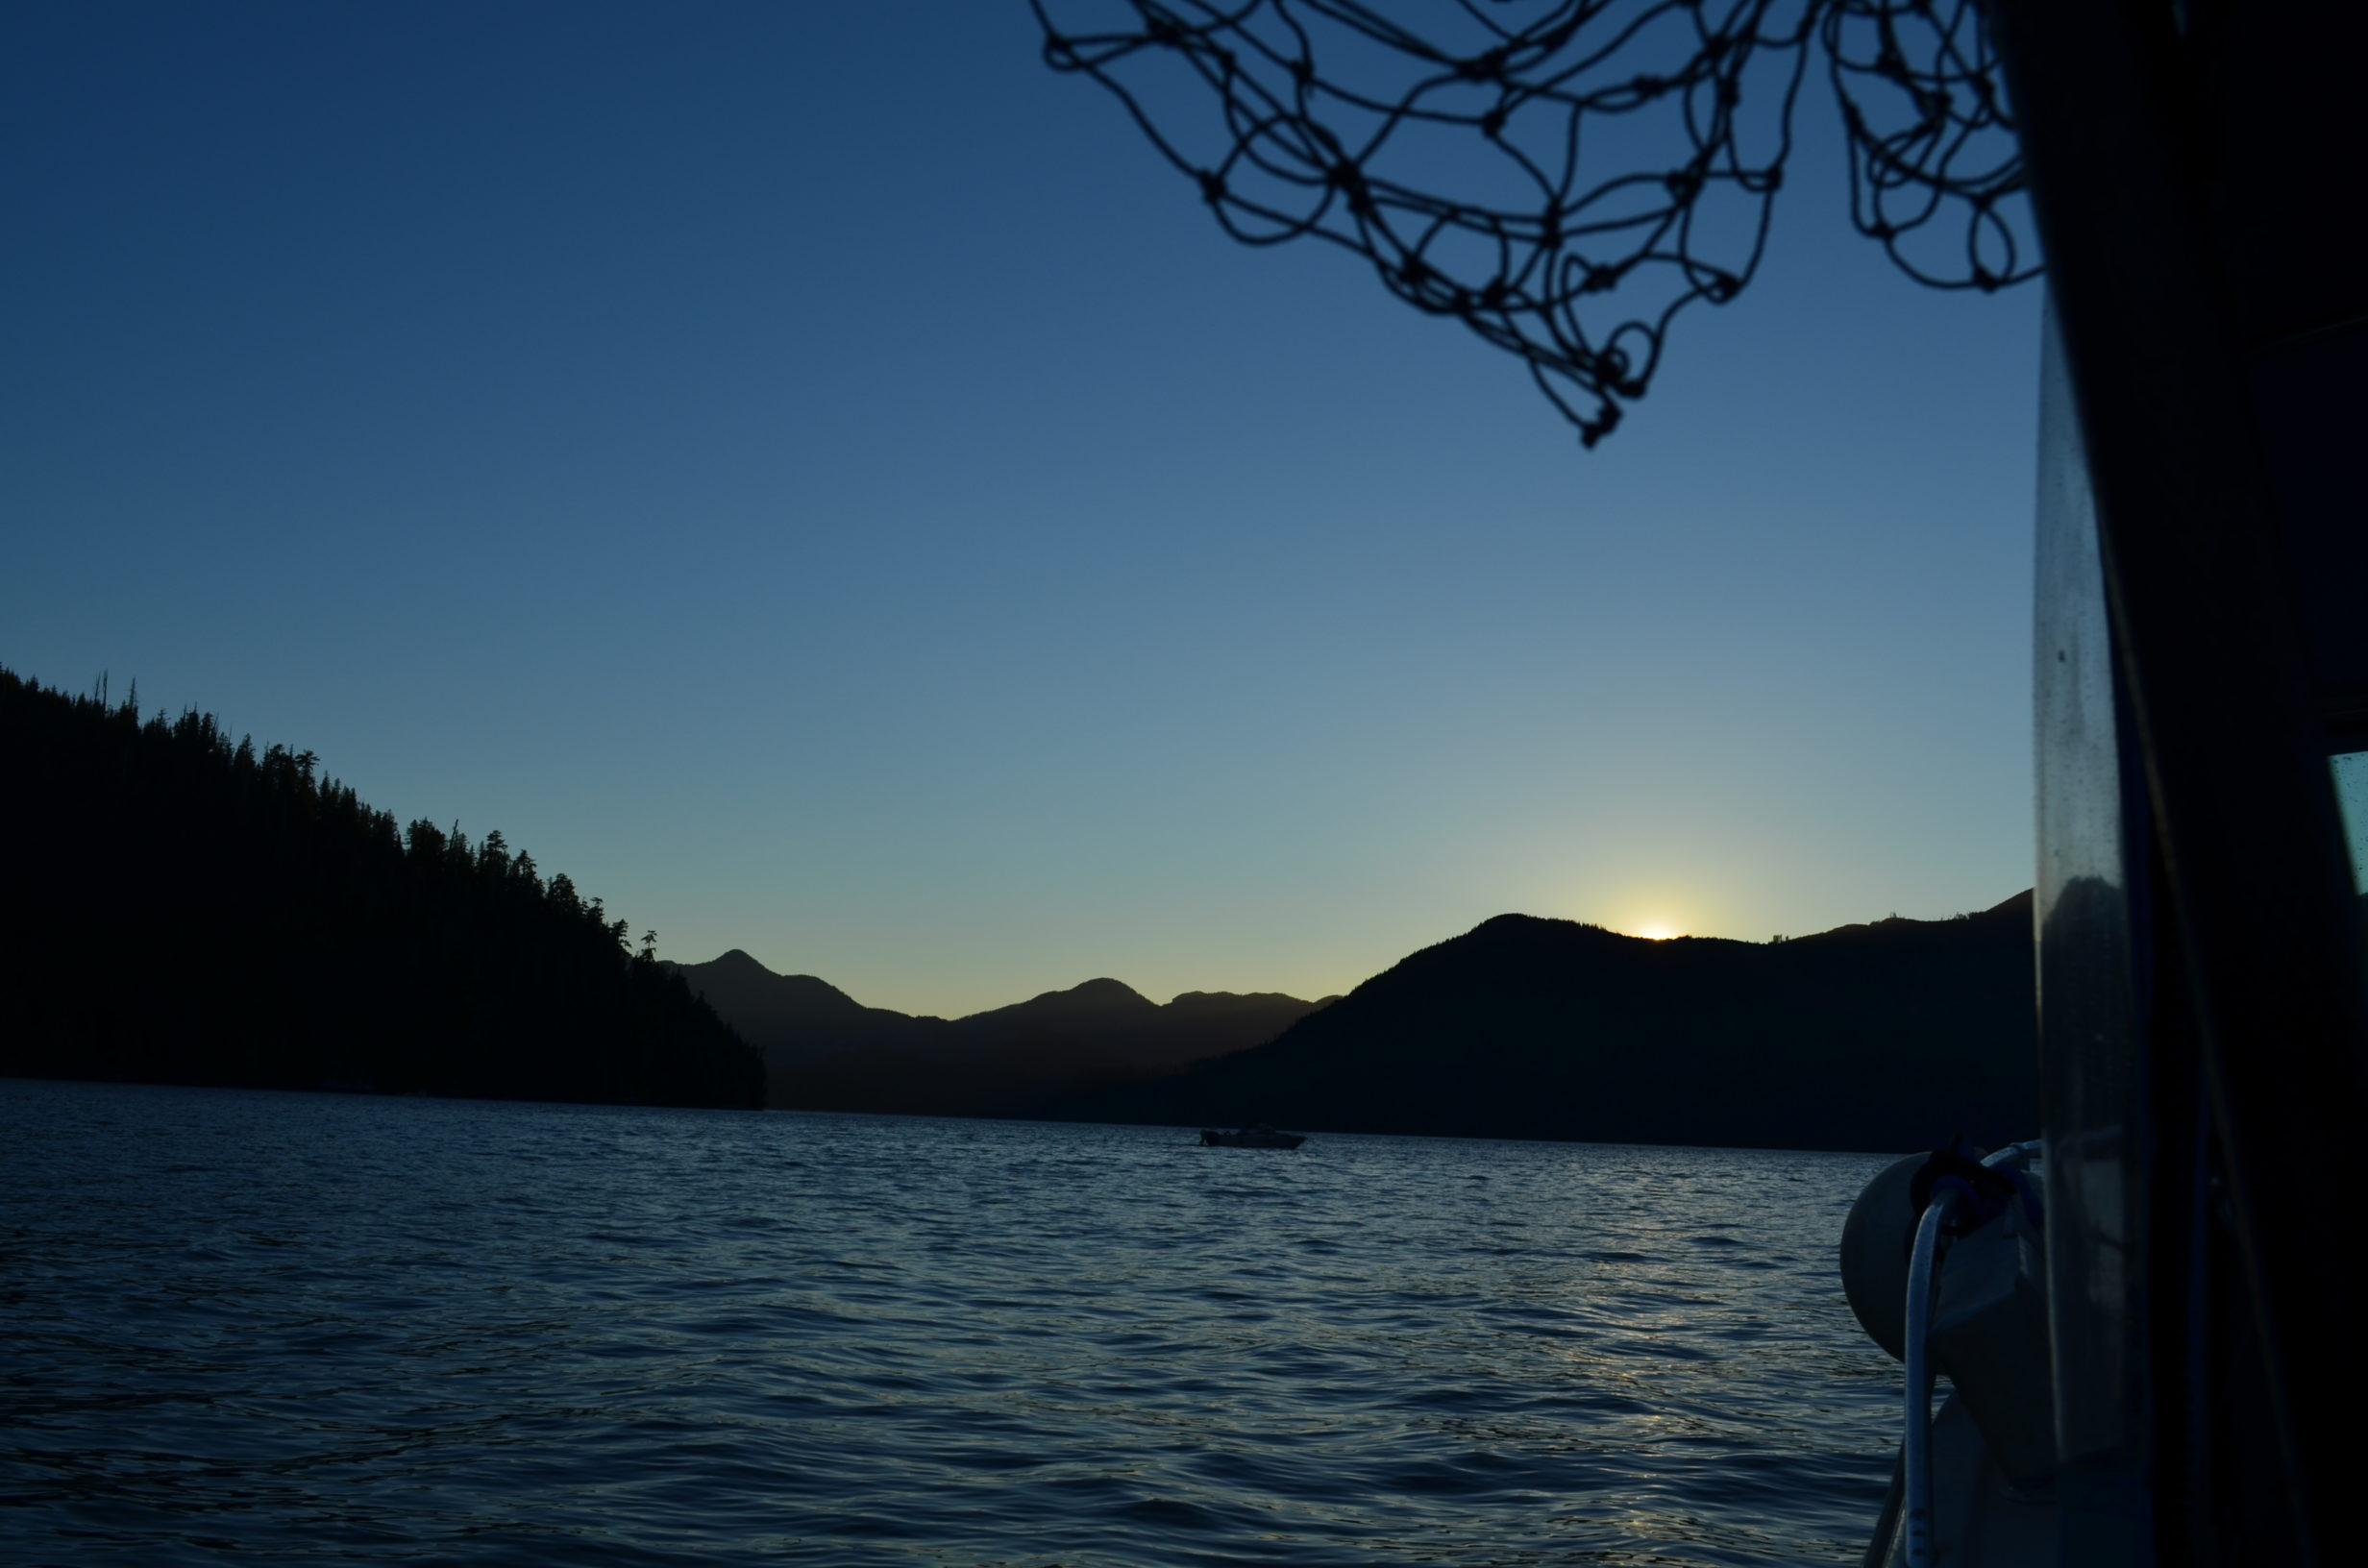 Sunset in Nootka